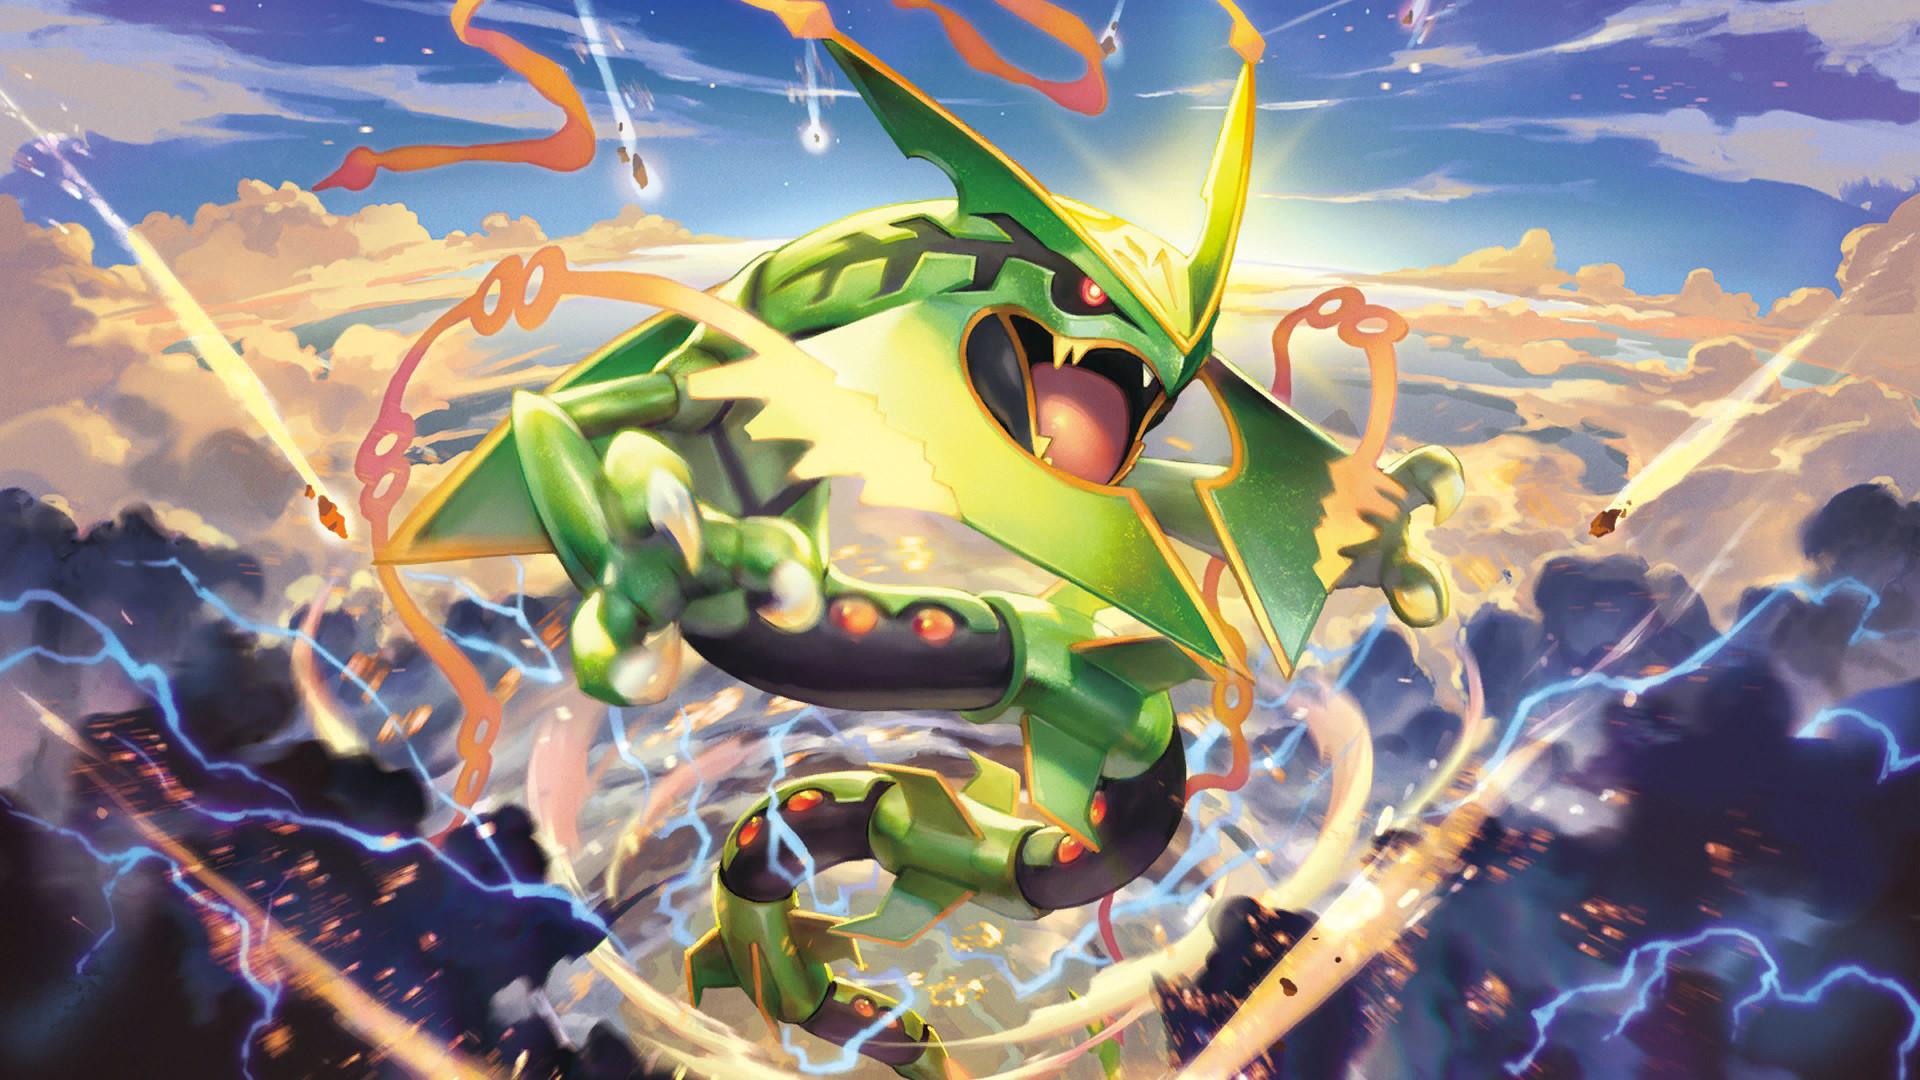 Res: 1920x1080, Anime - Pokémon Mega Rayquaza (Pokémon) Legendary Pokémon Wallpaper